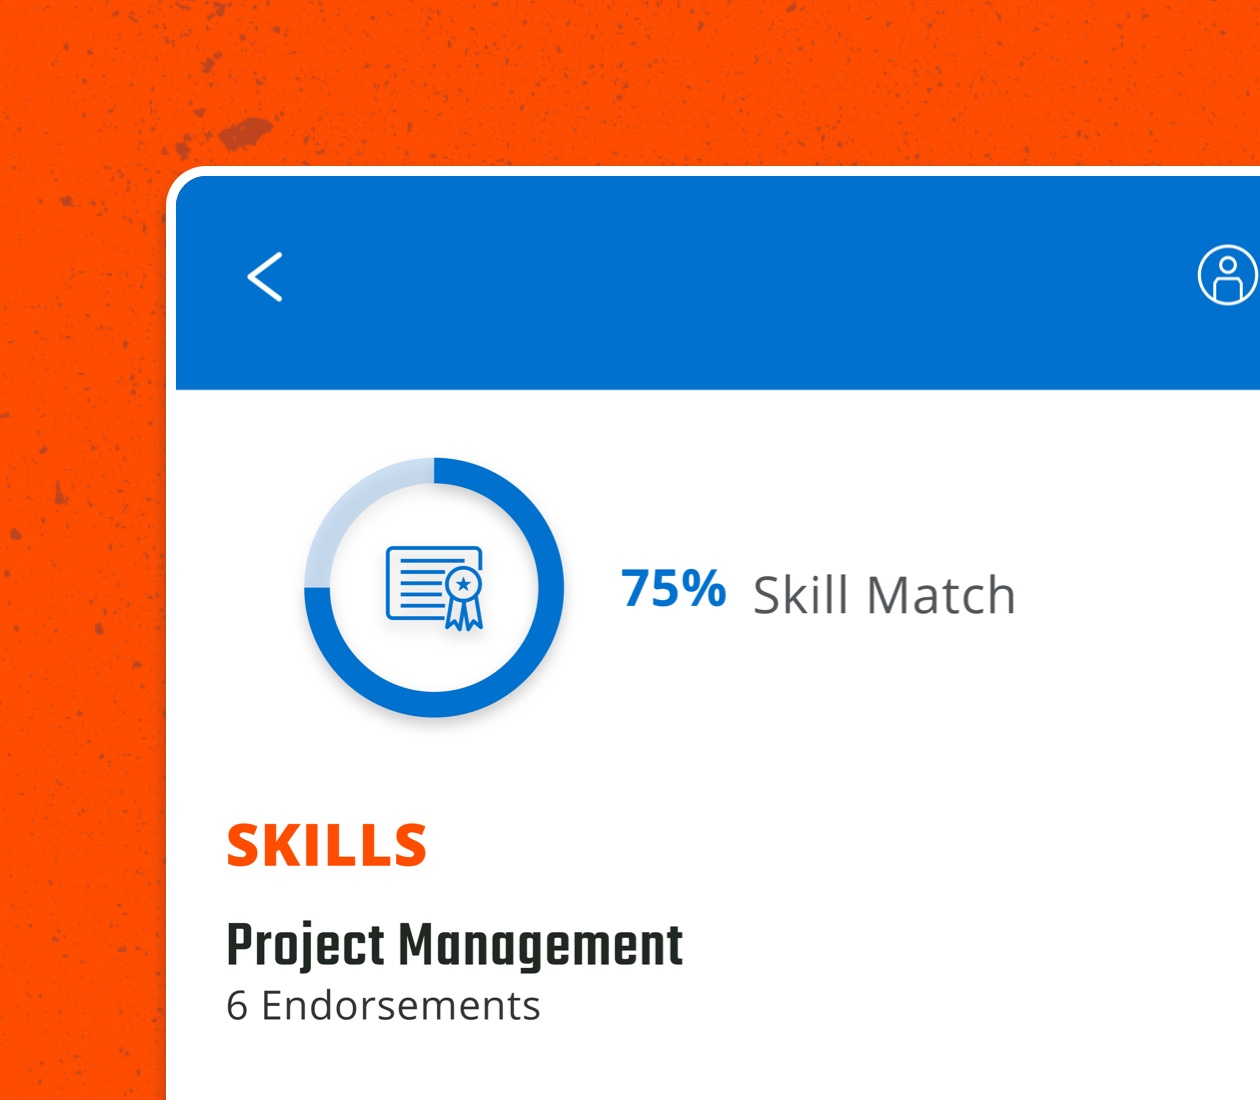 SkillMatch